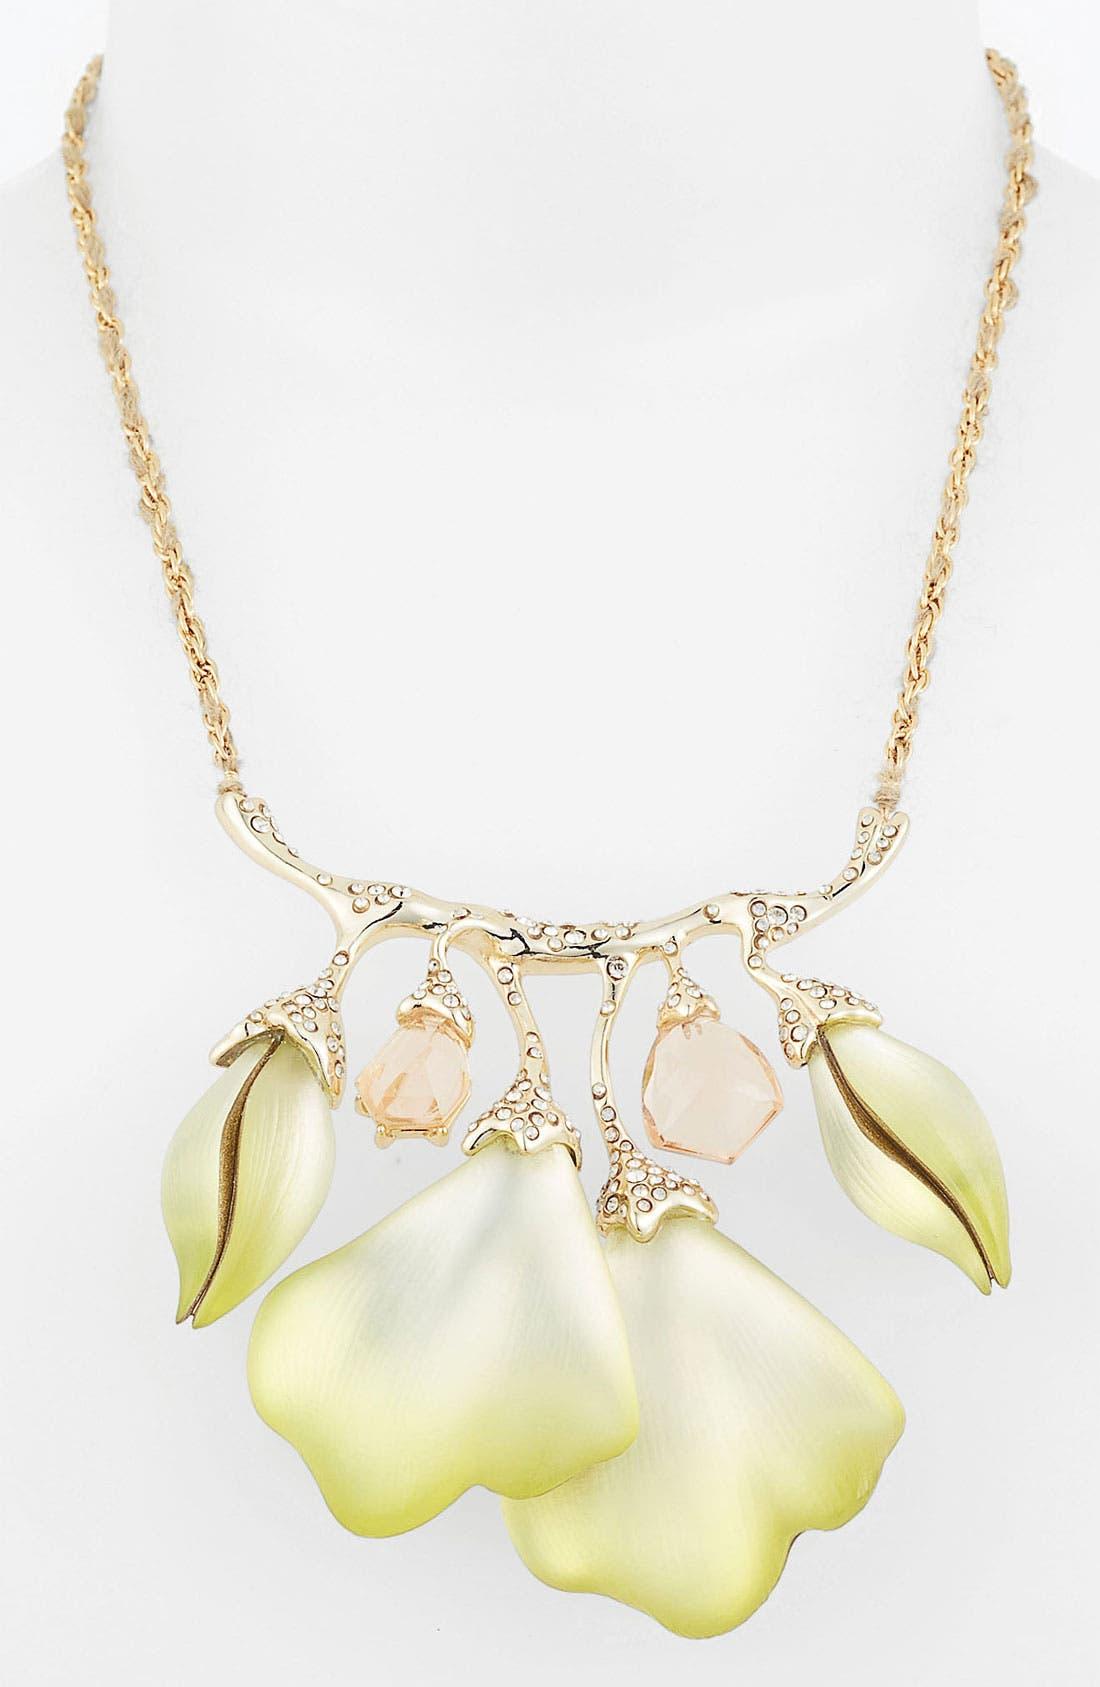 Alternate Image 1 Selected - Alexis Bittar 'Ophelia' Bib Necklace